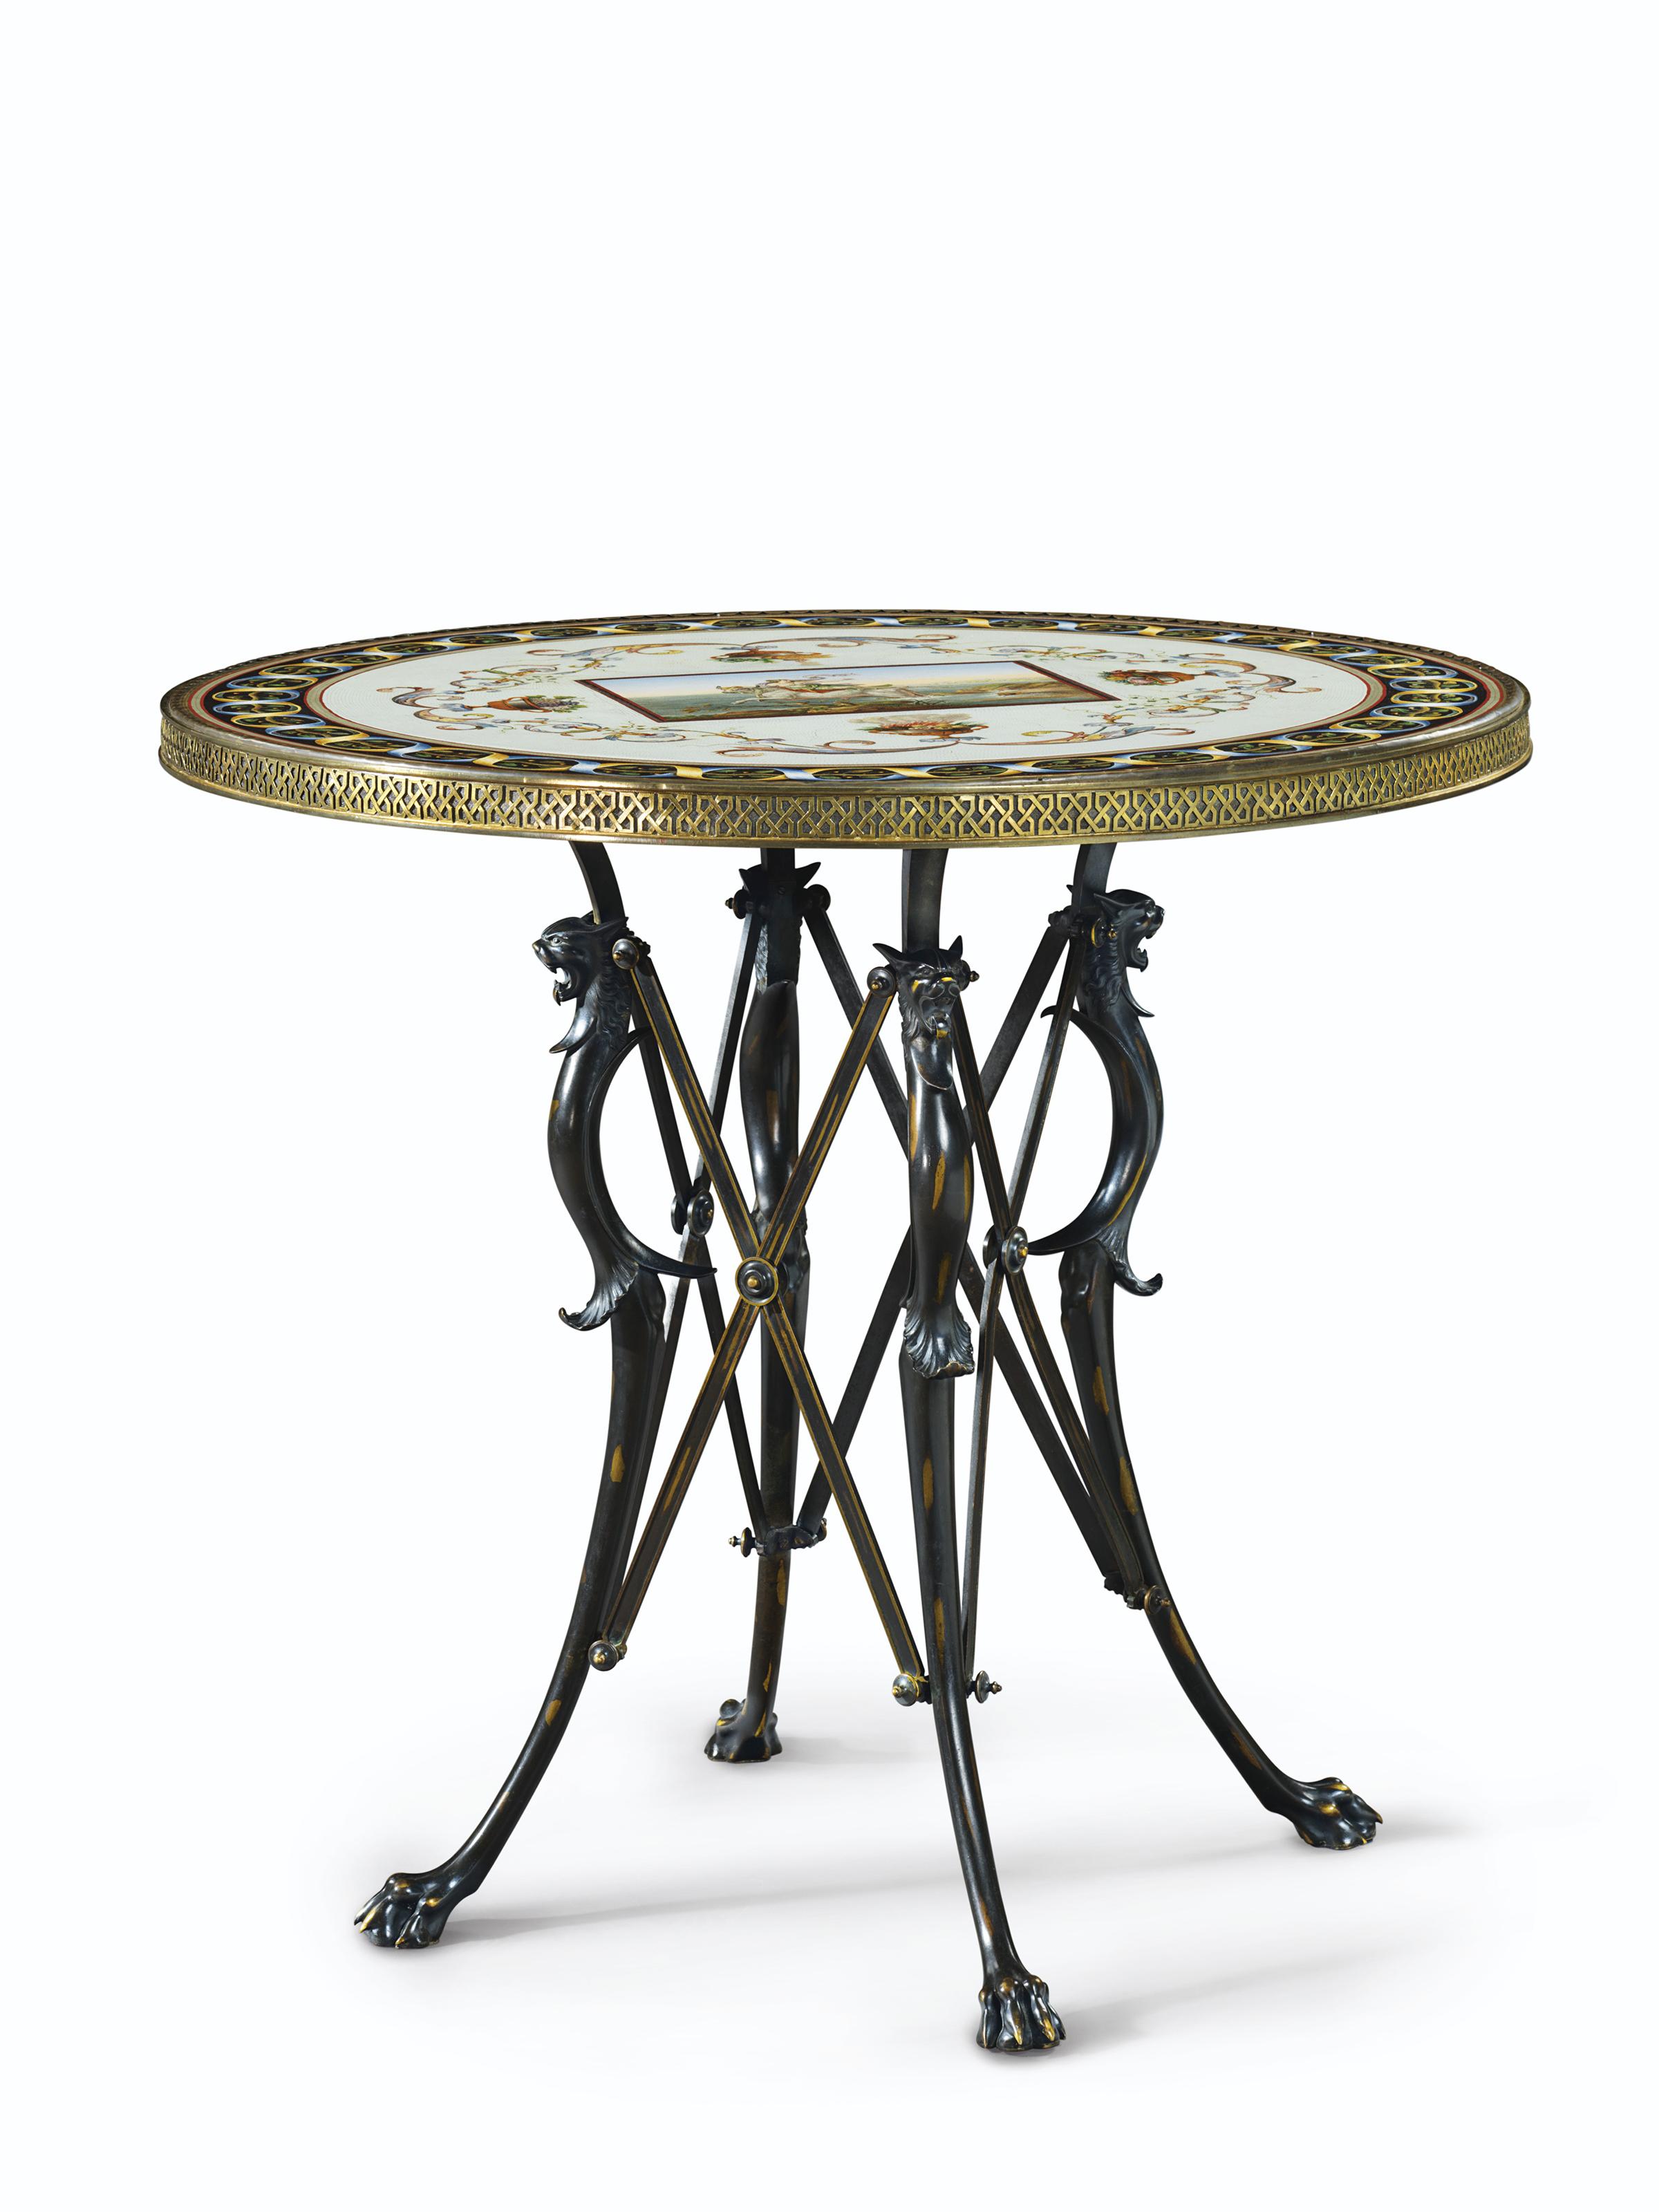 A ROMAN MICROMOSAIC TABLE